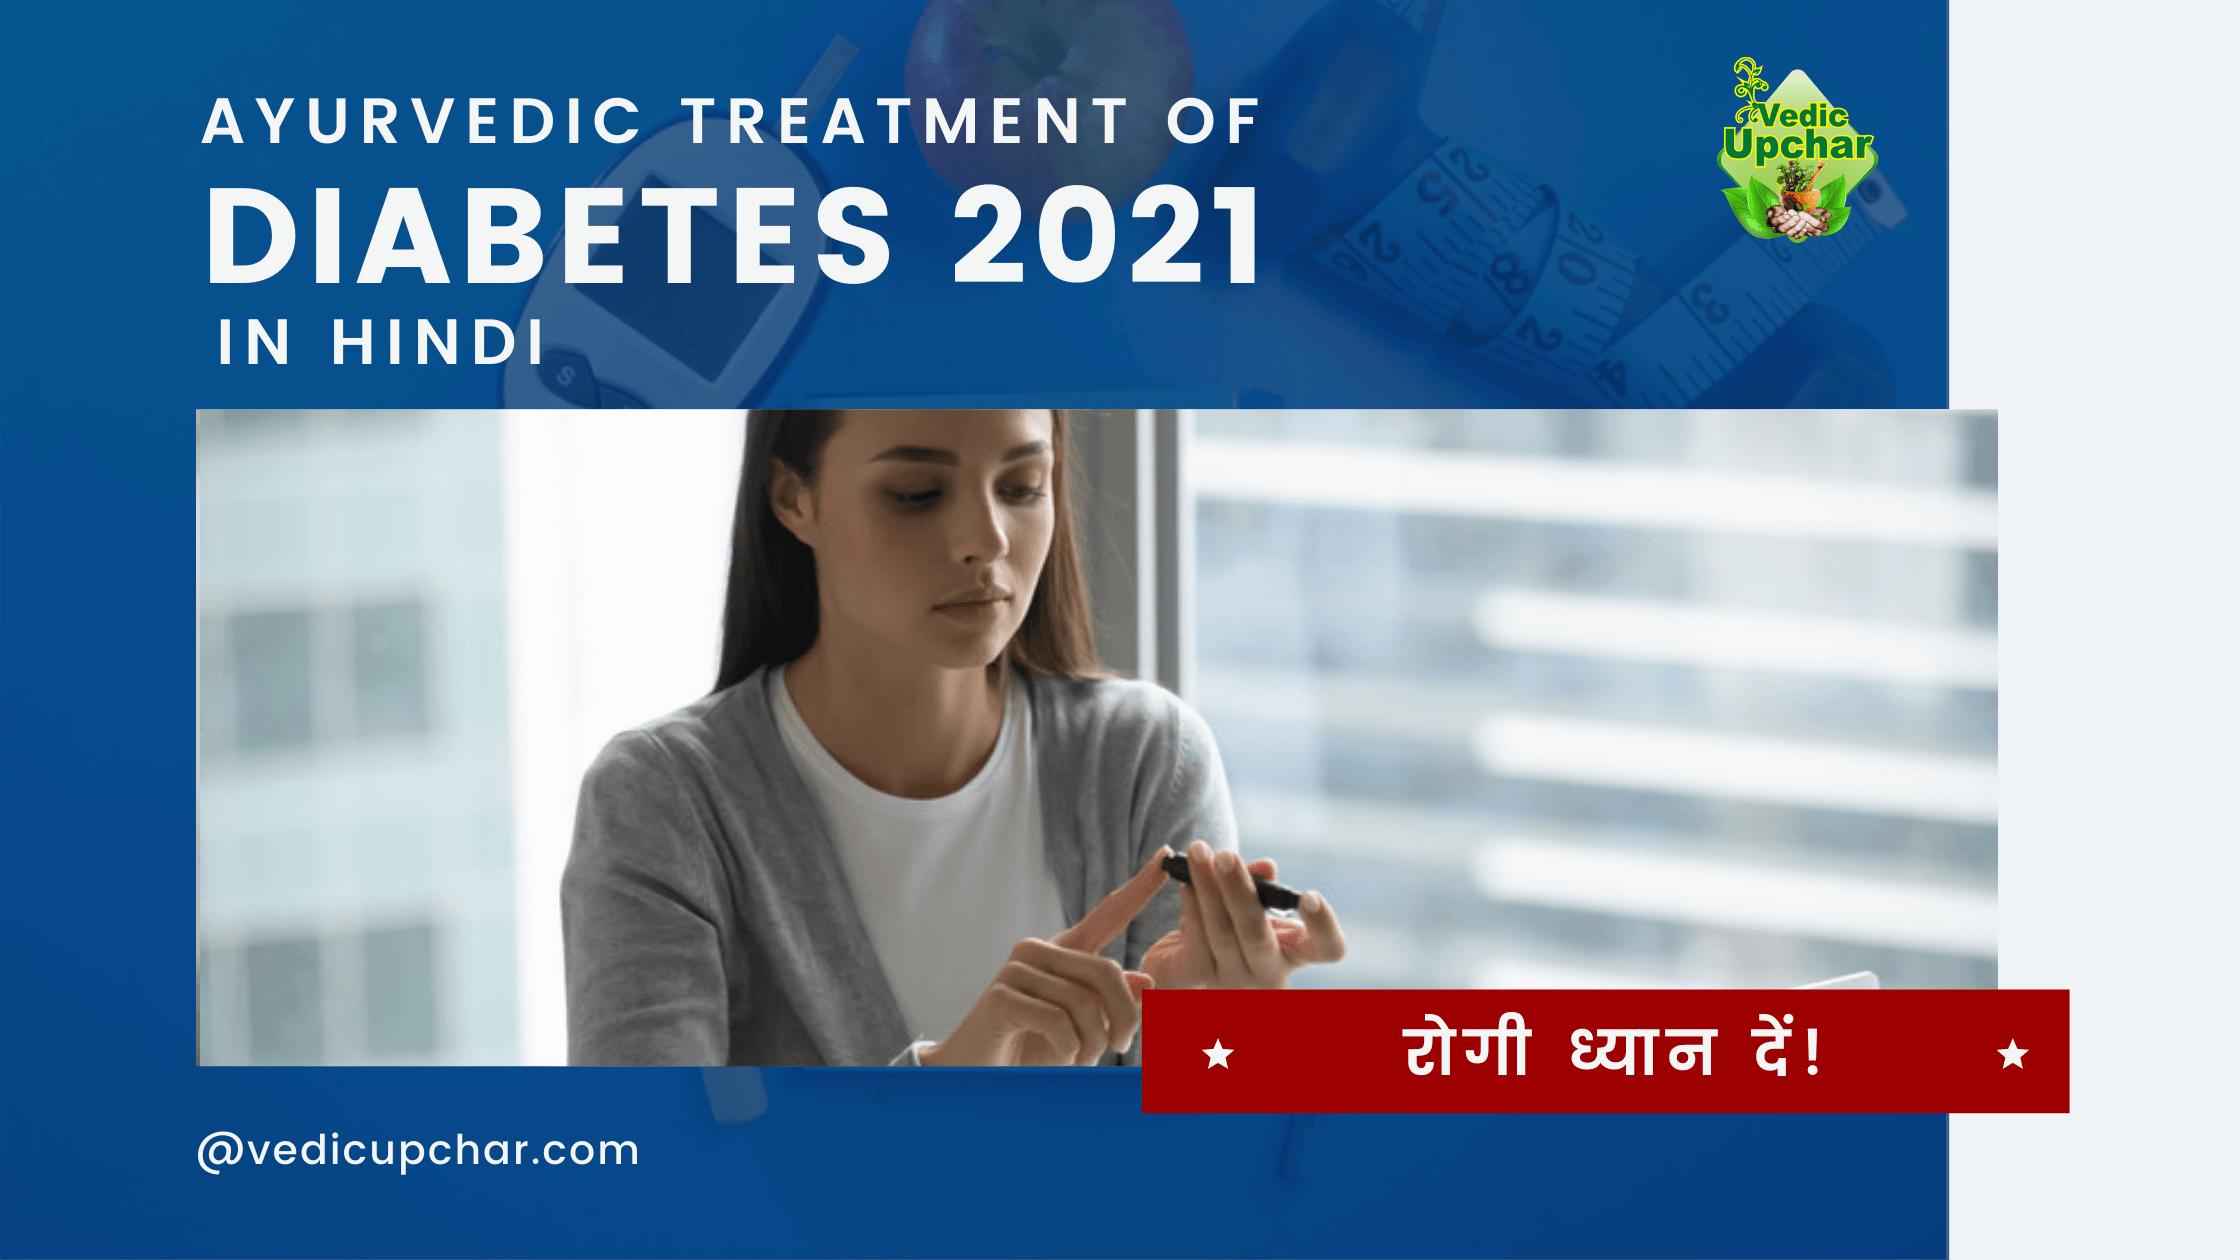 Ayurvedic Treatment of Diabetes (Madhumeh) 2021 in Hindi